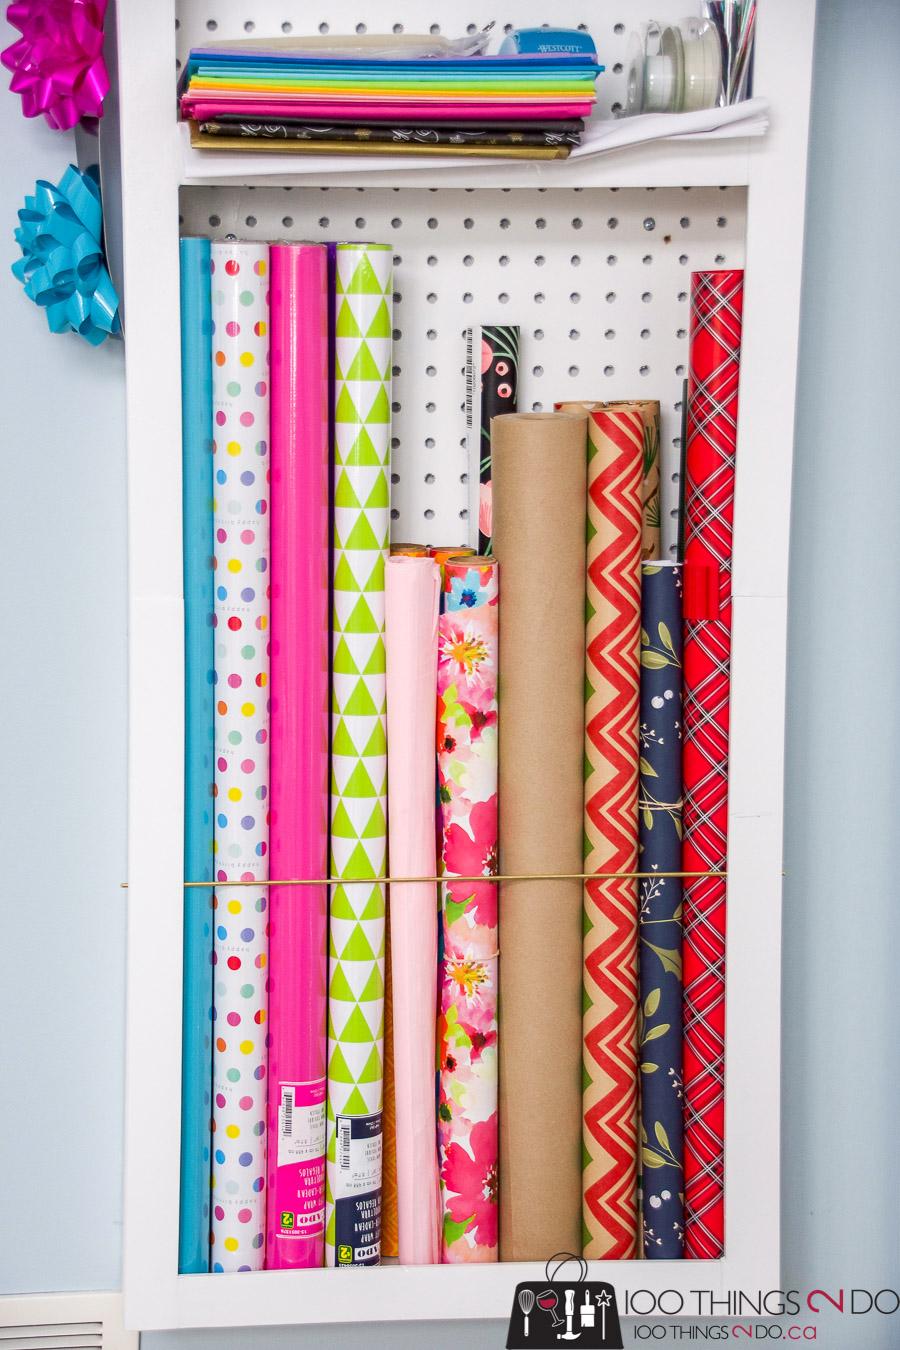 Behind-the-door-storage, behind the door storage rack, DIY door storage, gift wrap storage, wrapping paper storage, wrapping paper organization, organizing gift wrap